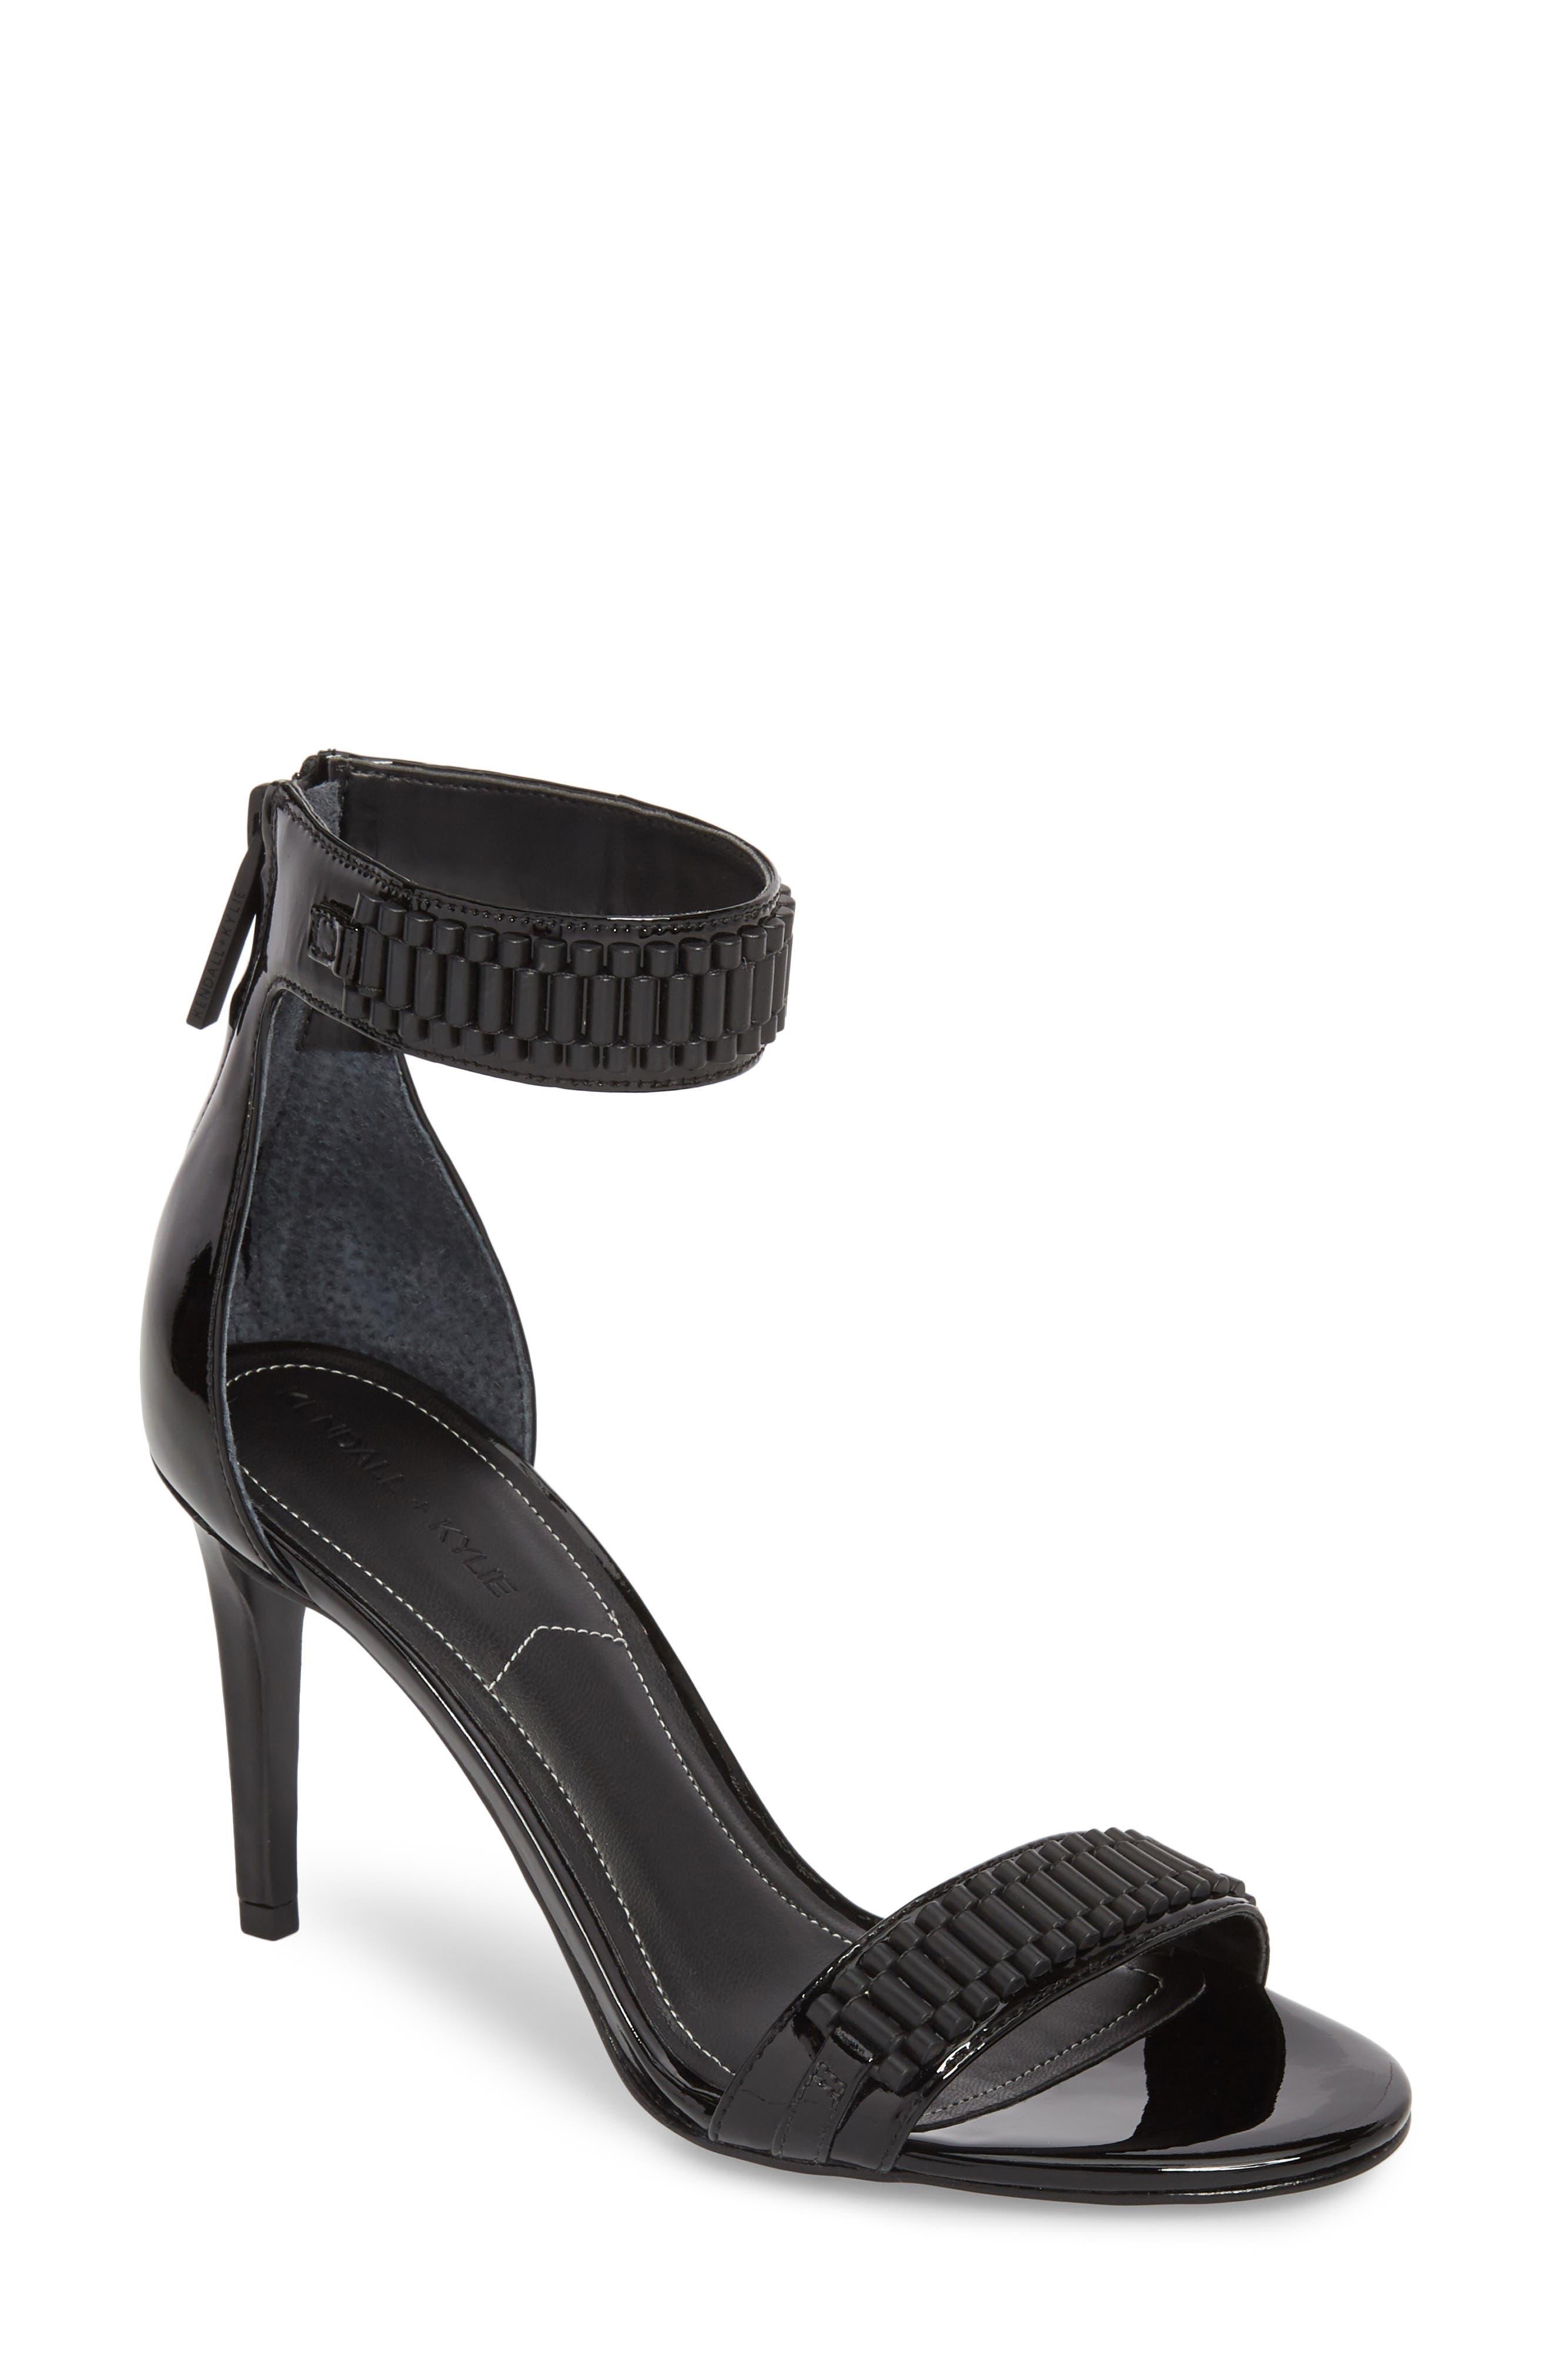 shoes heels black in tom pliss satin lyst sandals ford plisse